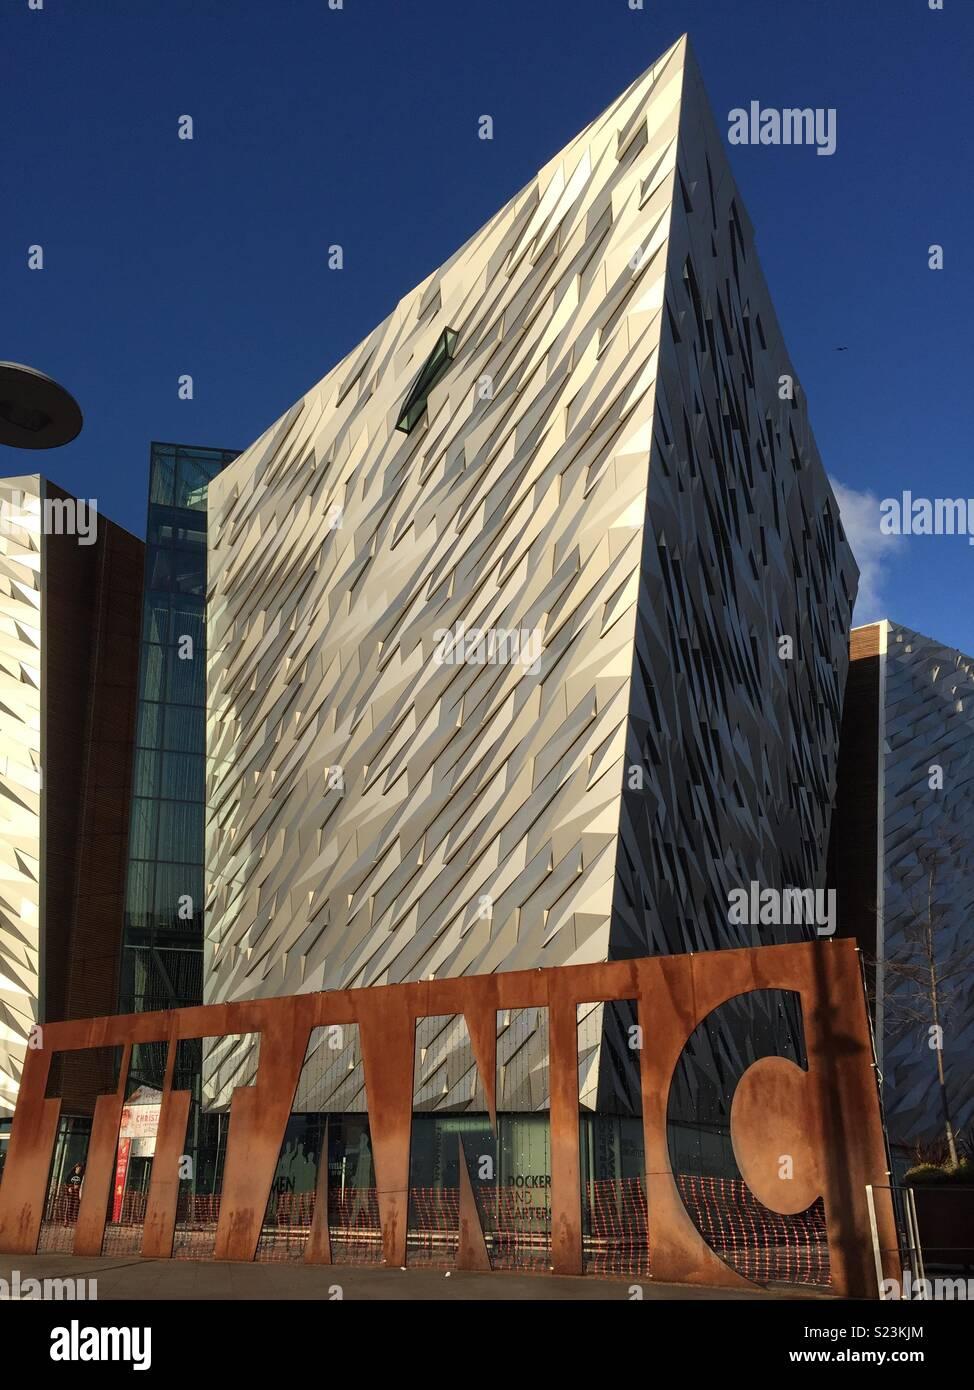 Titanic museum Belfast, sunny day - Stock Image